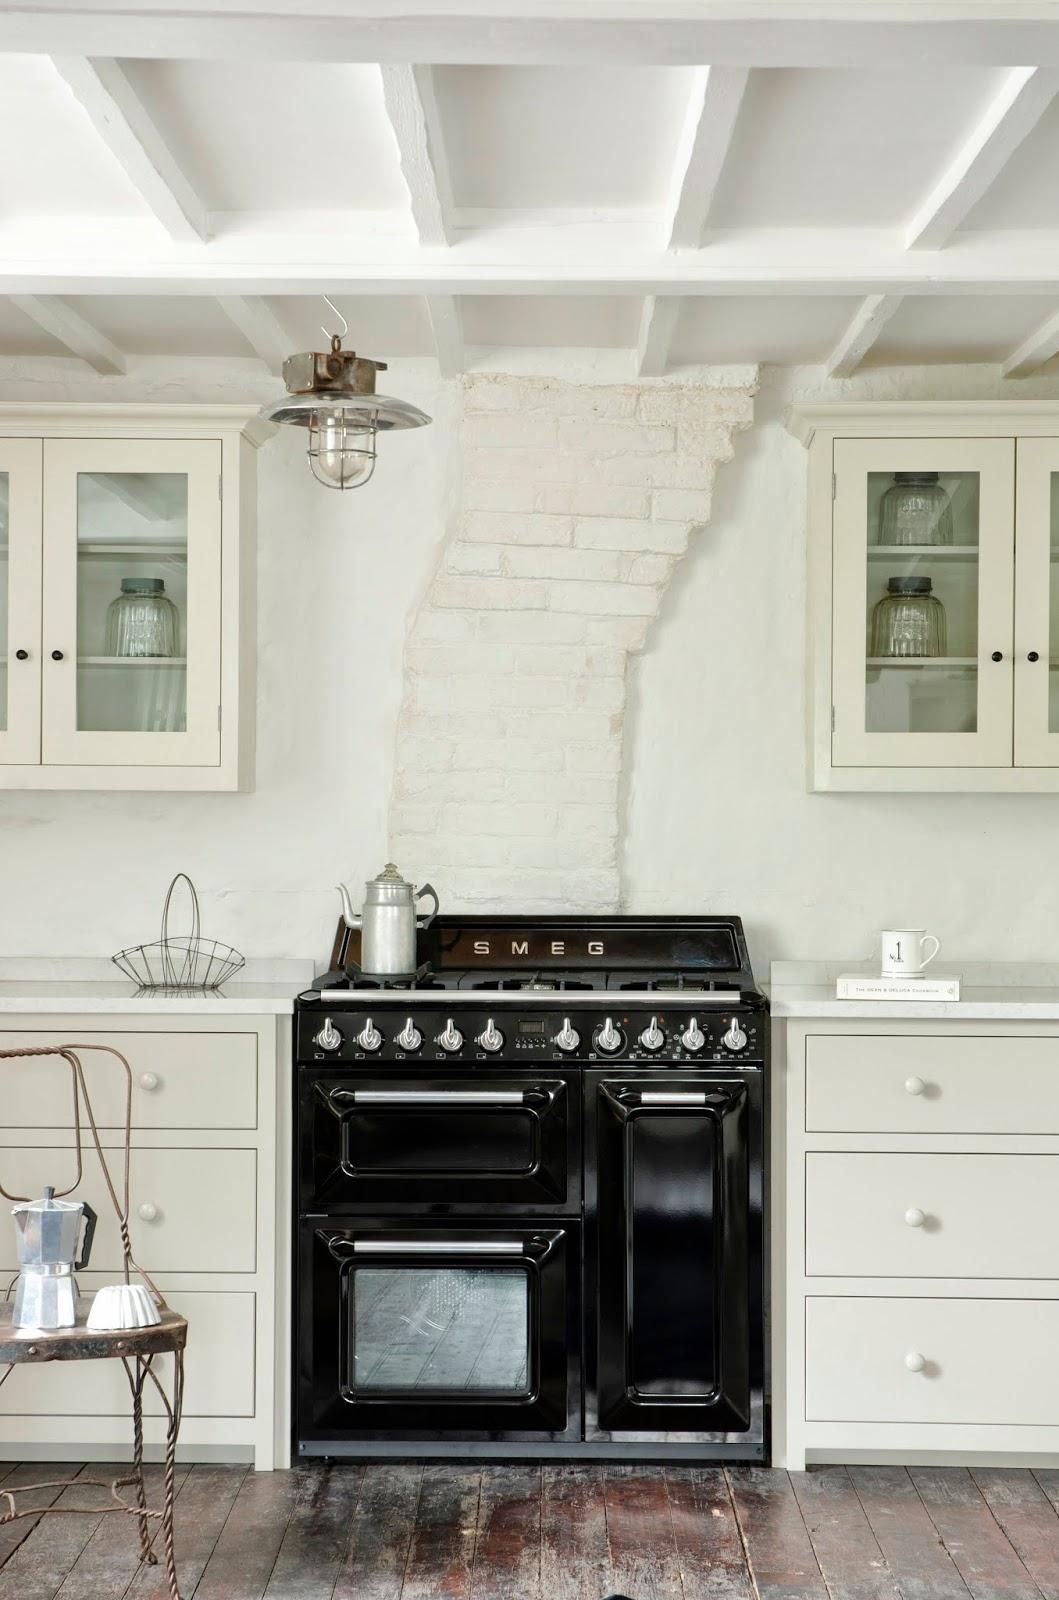 Smeg fridges and other kitchen appliance viskas apie for Smeg kitchen designs